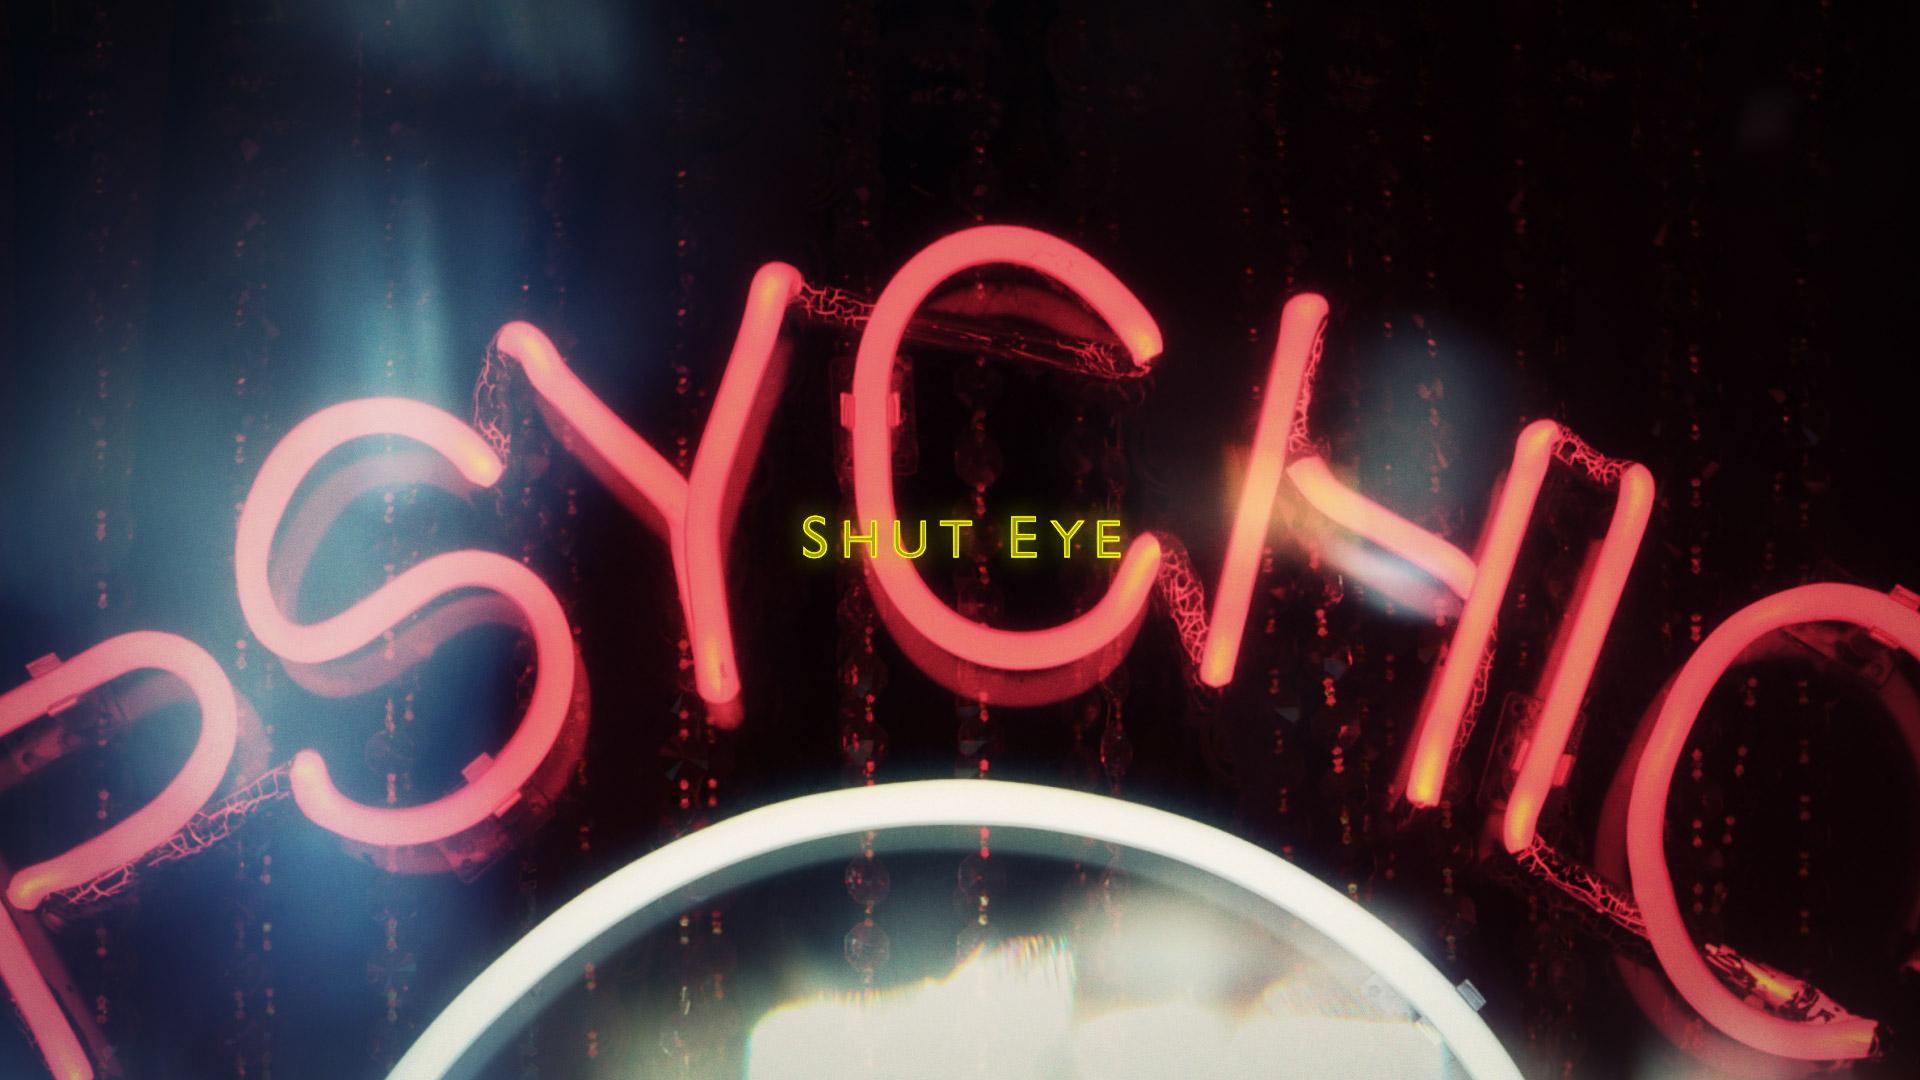 tcgstudio-shut-eye-main-title-v3_00003.jpg